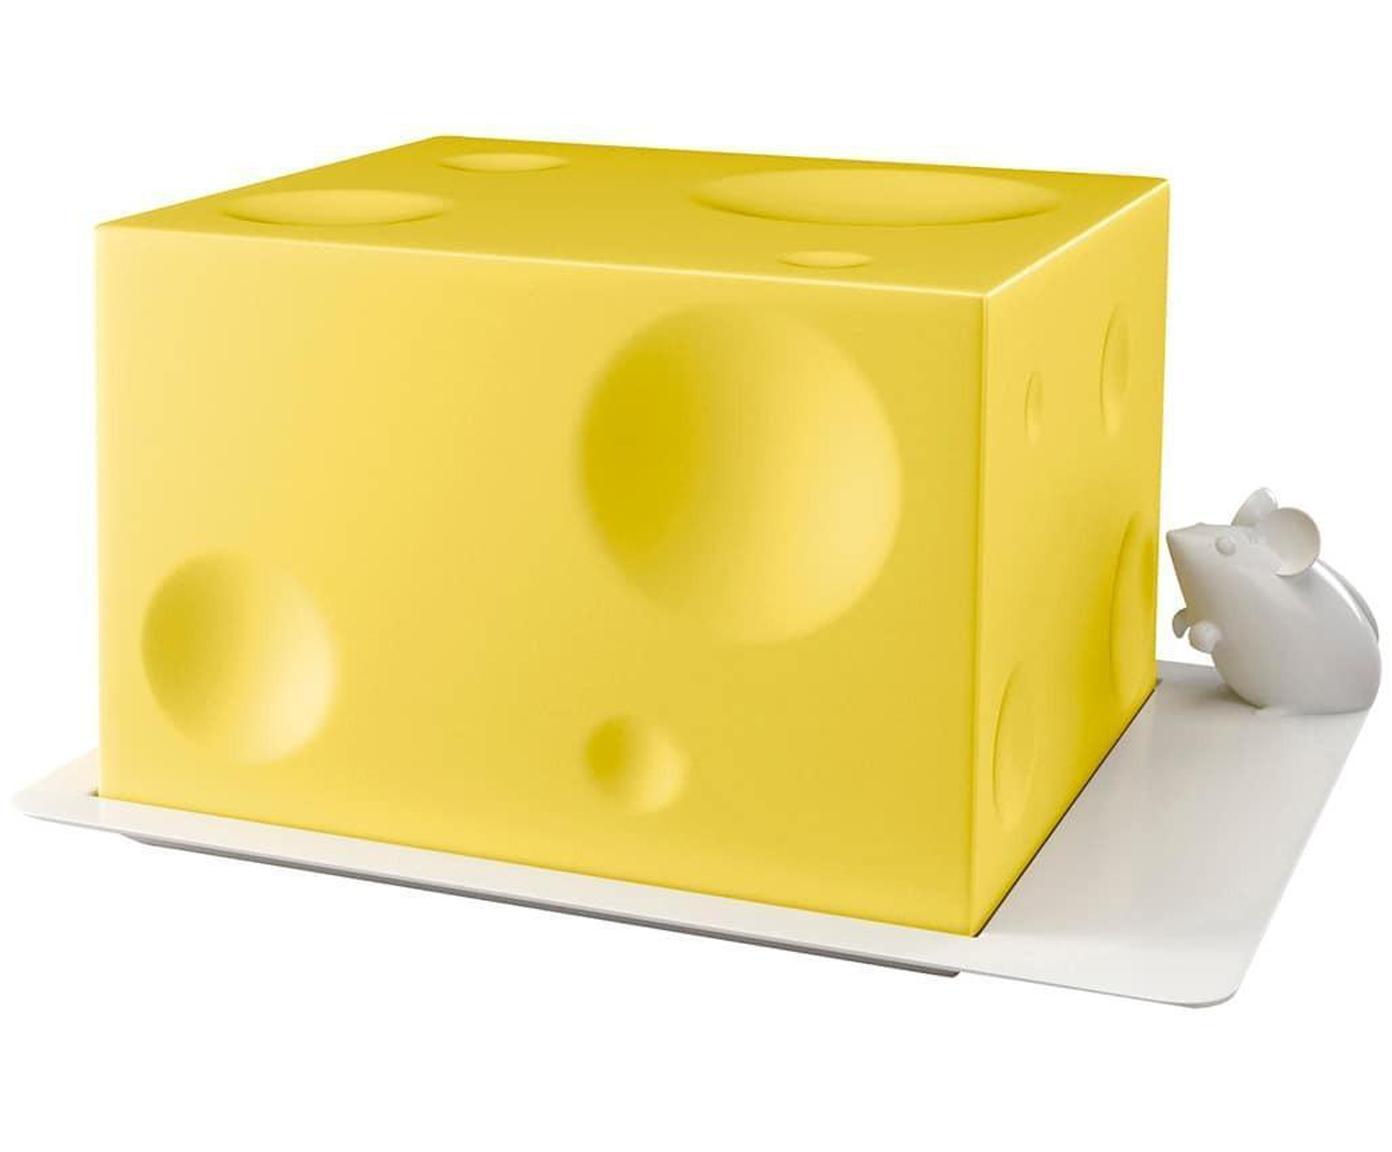 Quesera I Love Cheese, Plástico ABS, Amarillo, blanco, An 19 x Al 14 cm